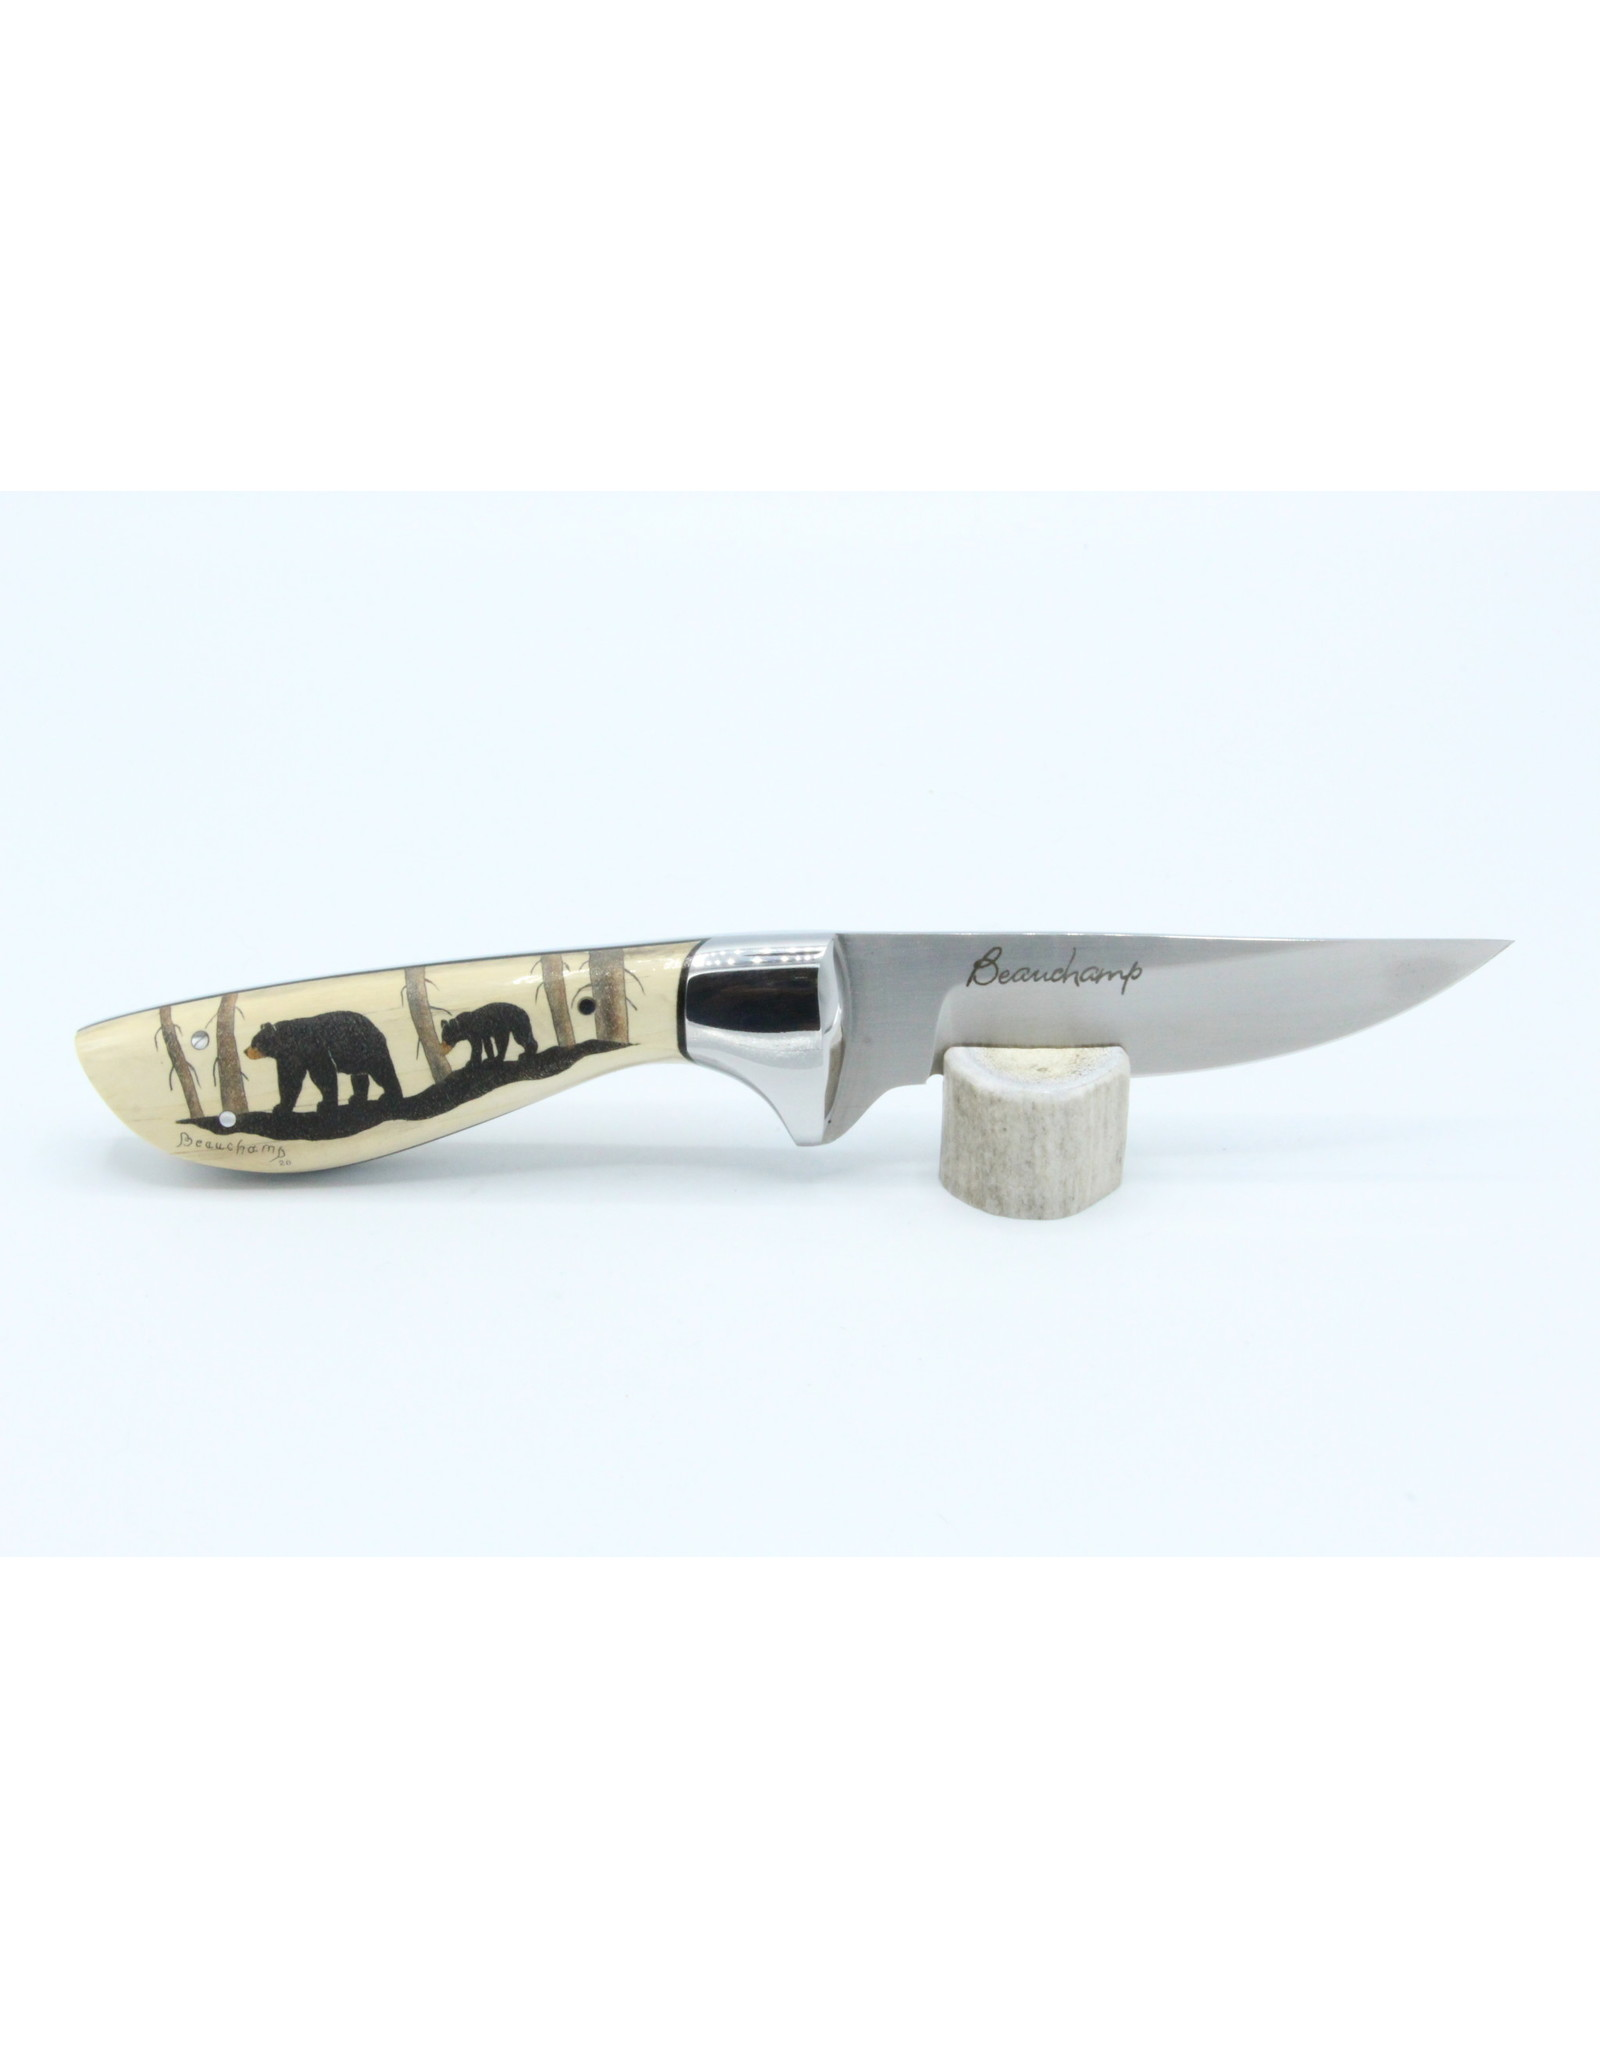 Fossilized Mammoth Ivory Knife - #35